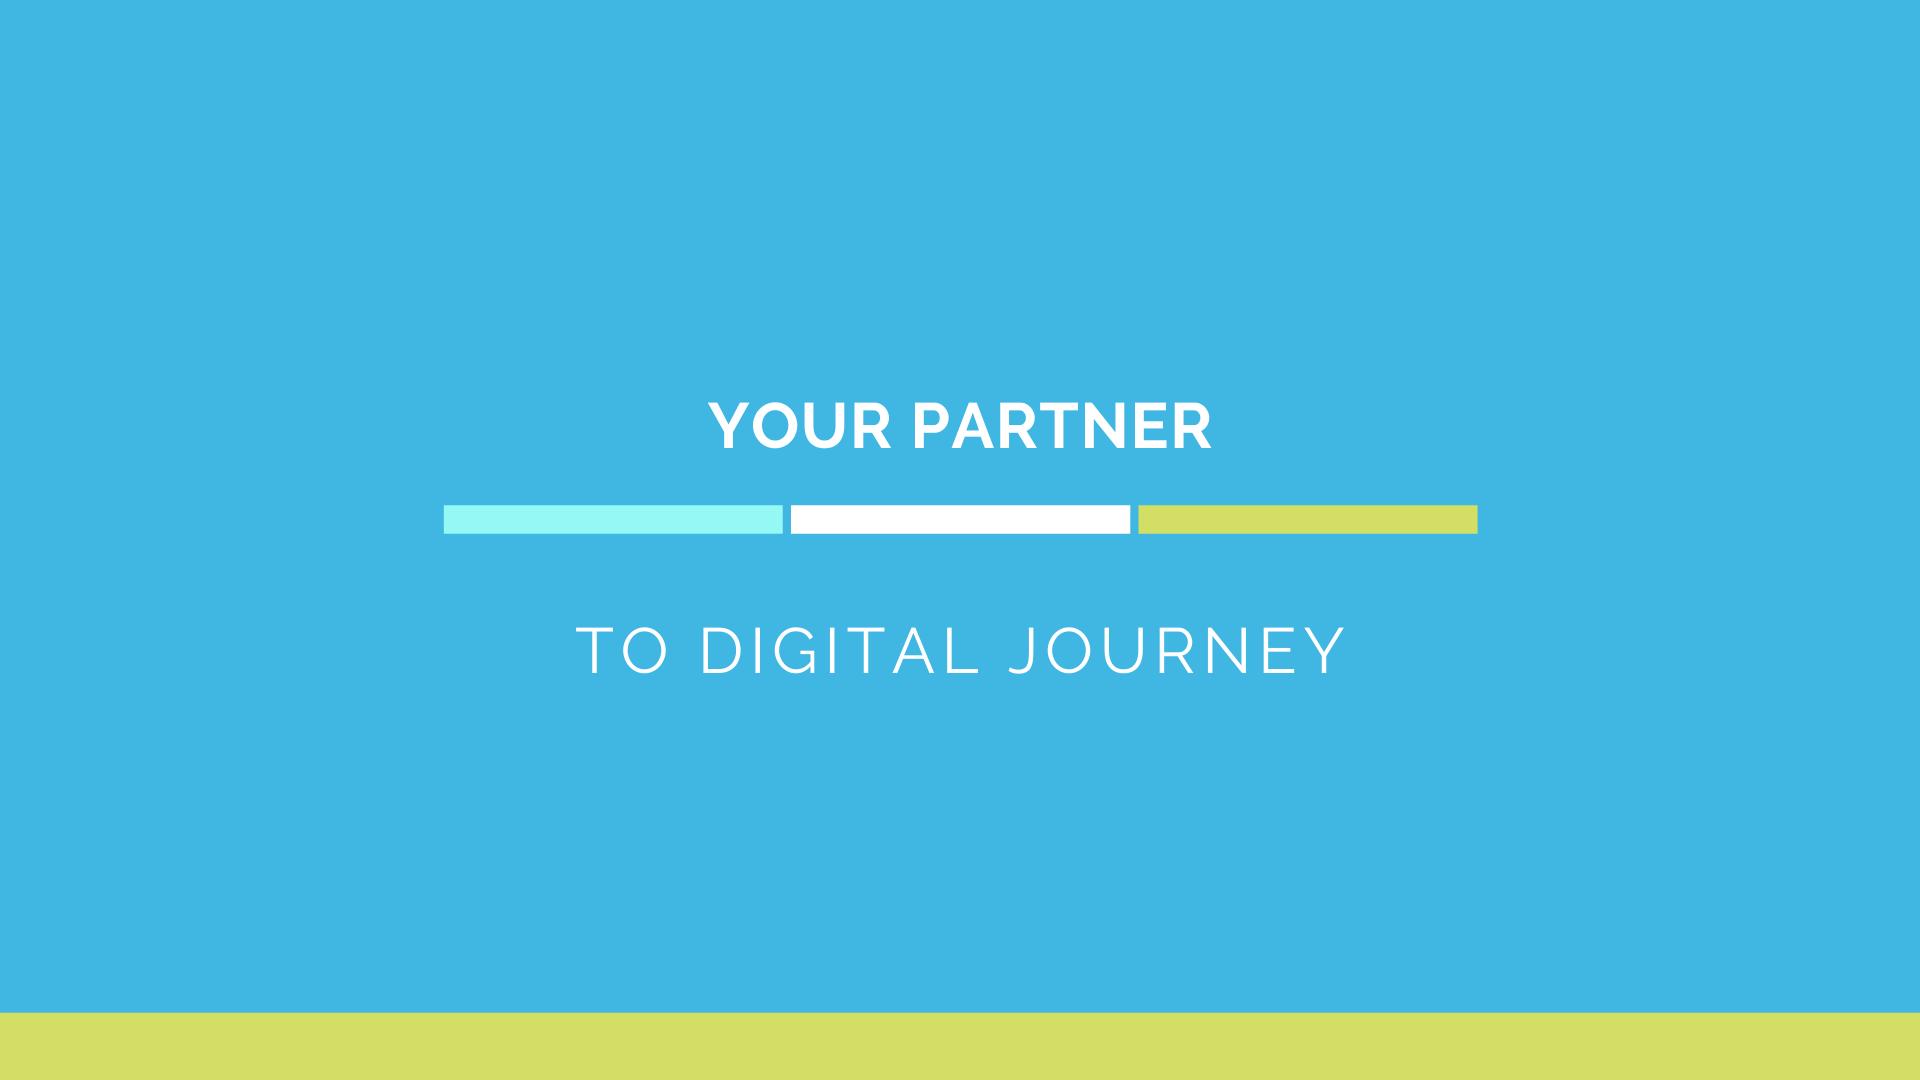 Partner to Digital Journey - CocoonIt Services Mumbai